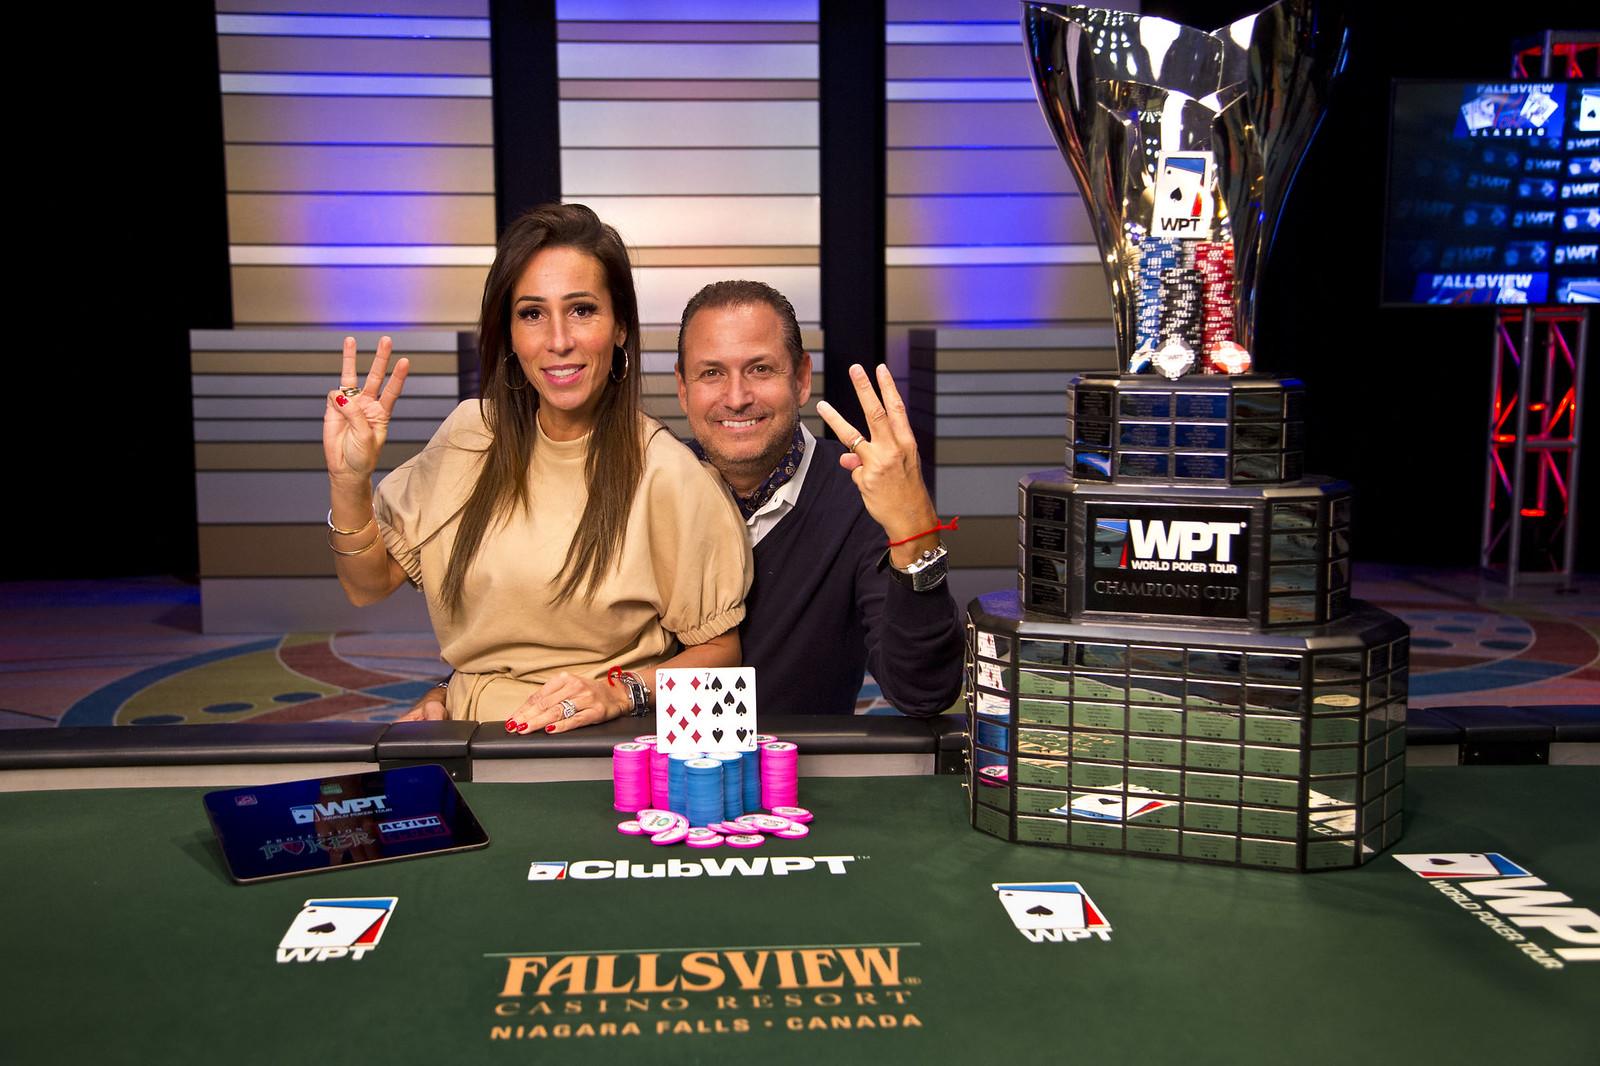 casino niagara poker blinds betting